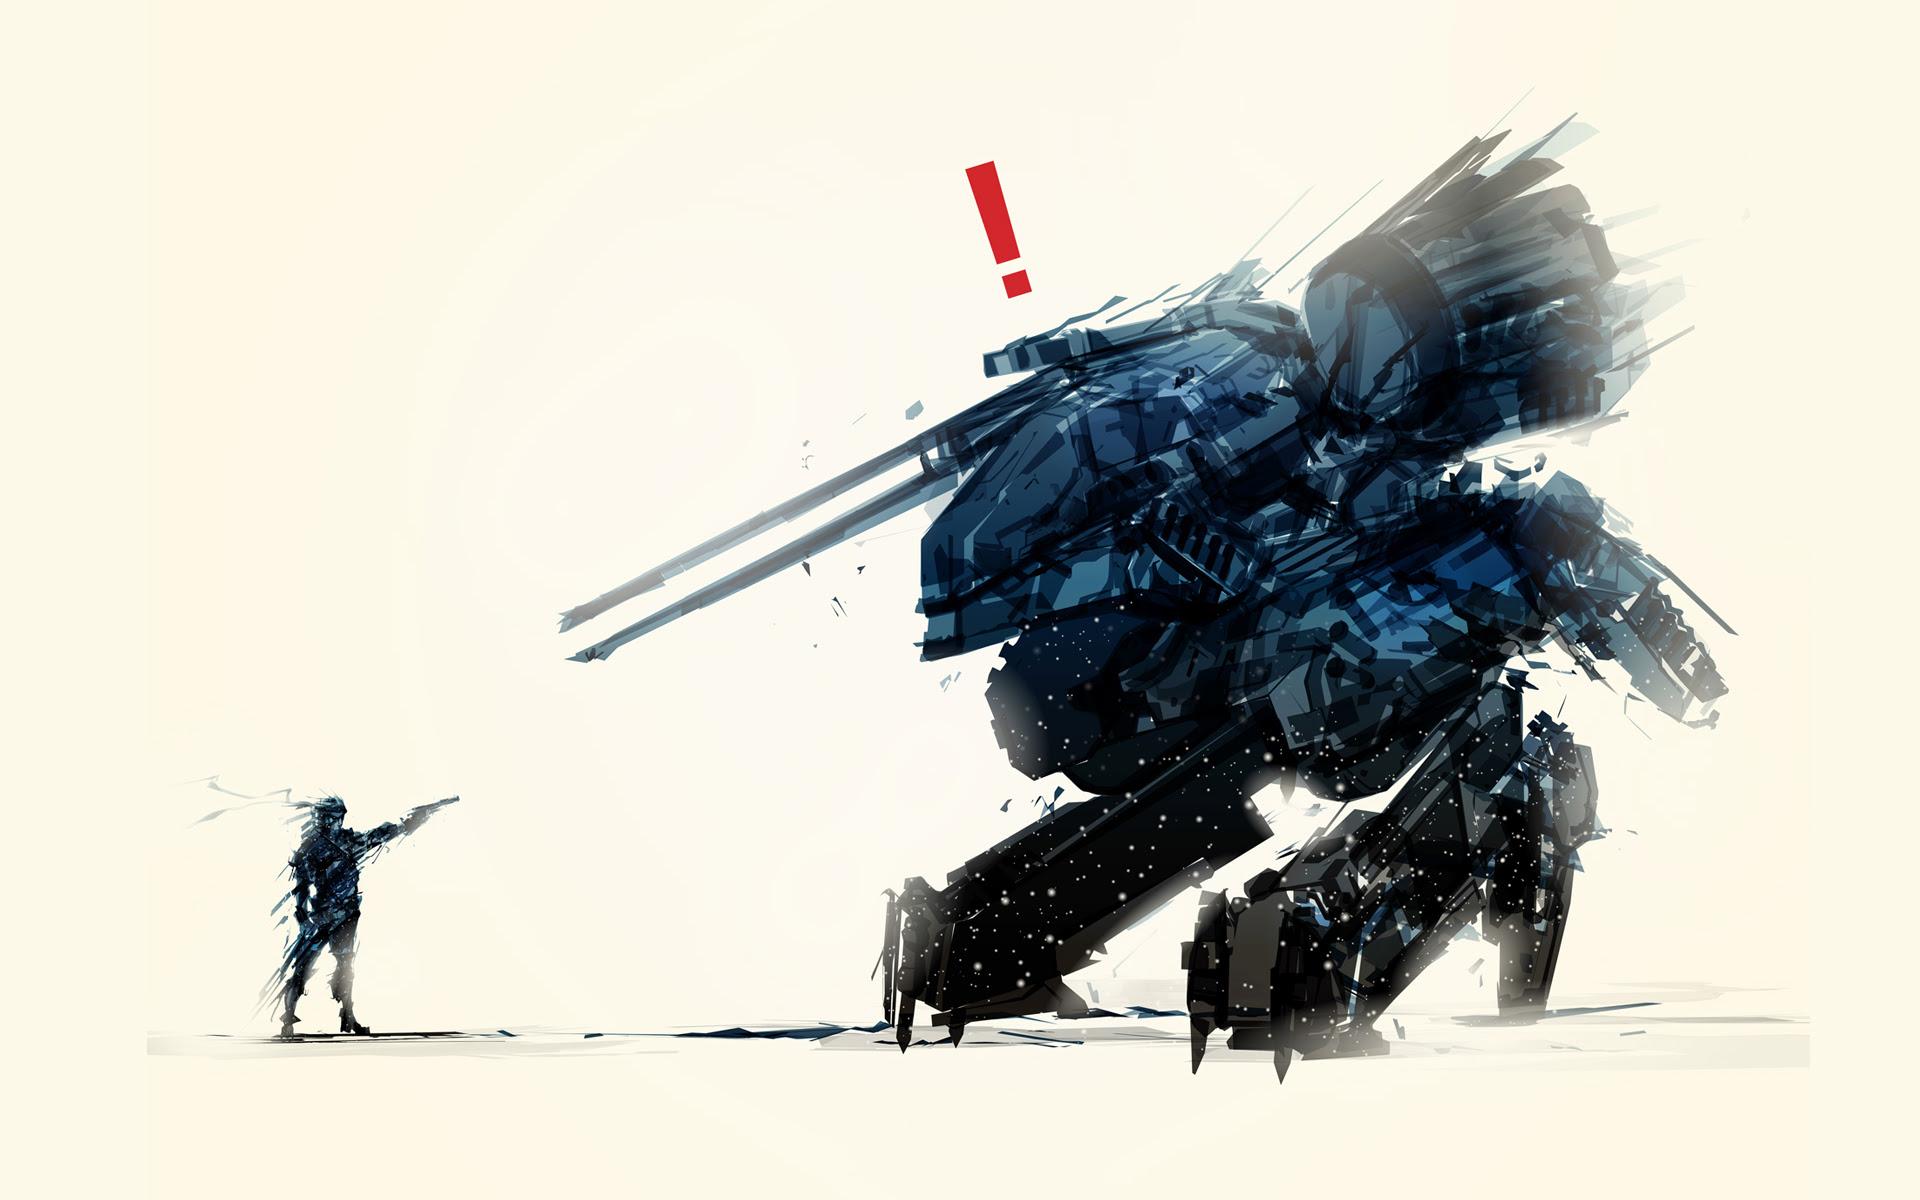 Metal Gear Solid Art Wallpaper 1920x1200 10765